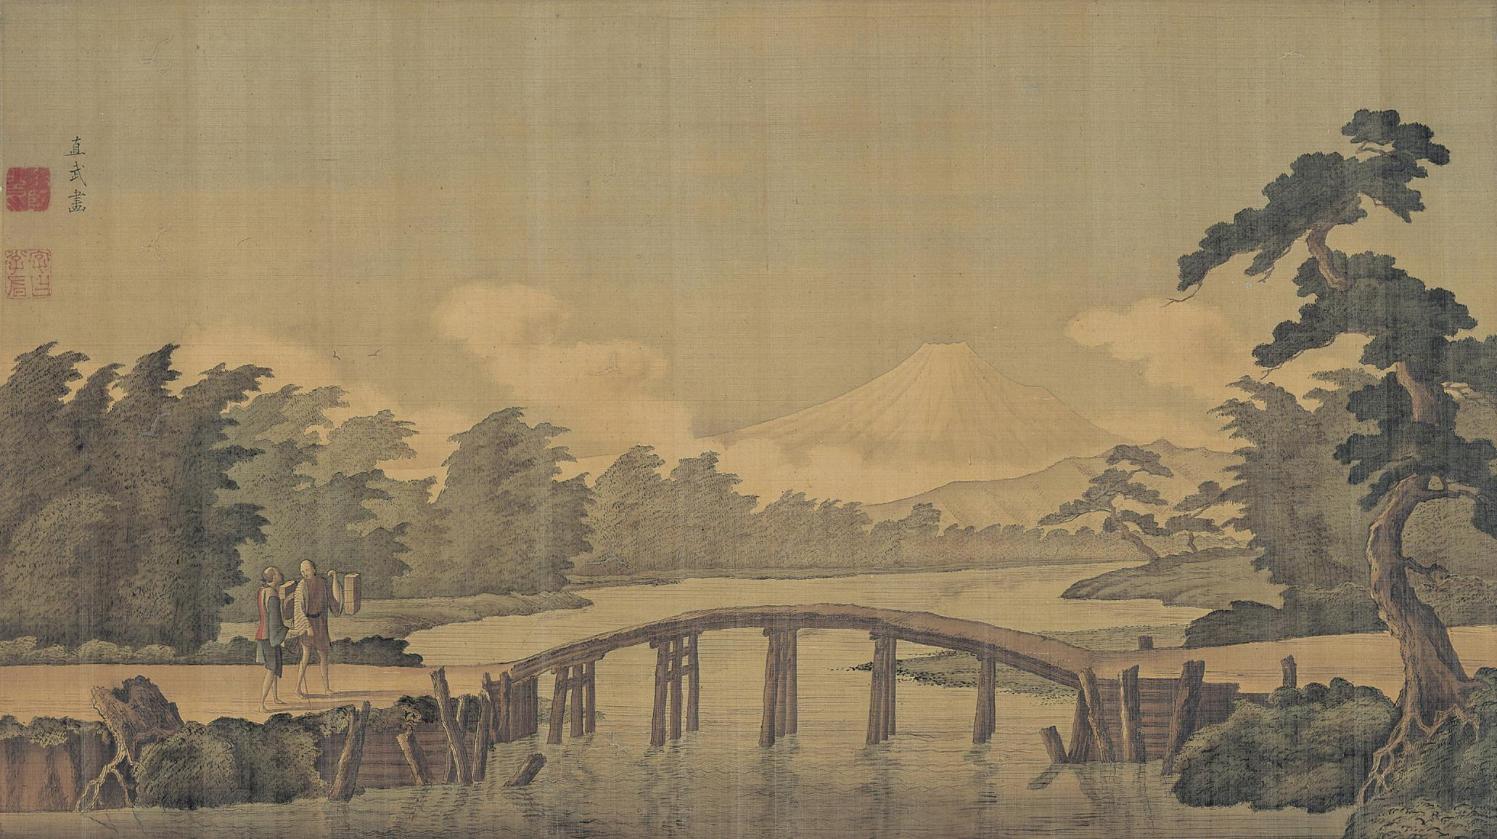 the akita ranga artist essay